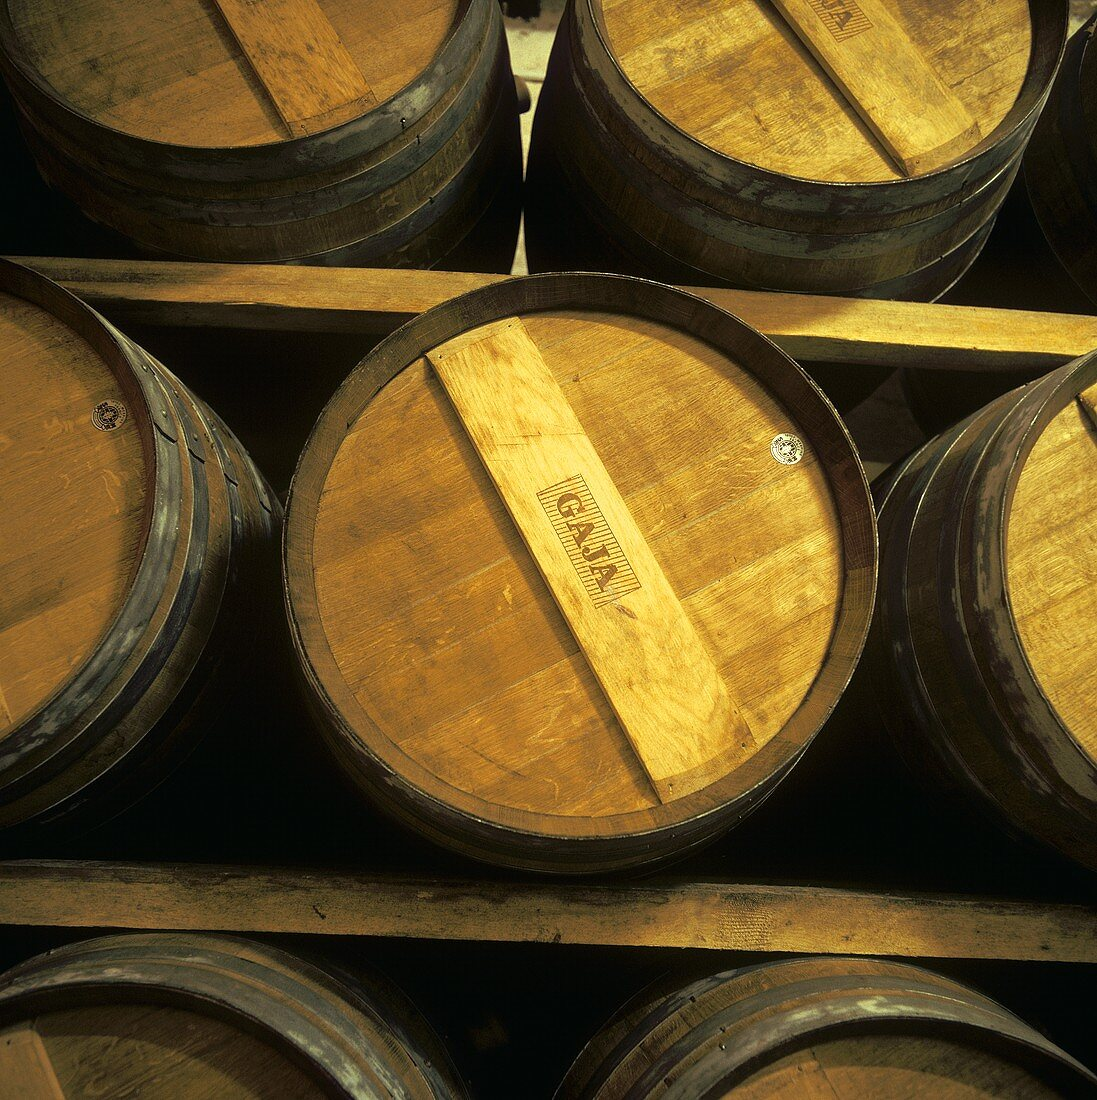 Oak barrels in Gaja wine cellar, Barbaresco, Piedmont, Italy